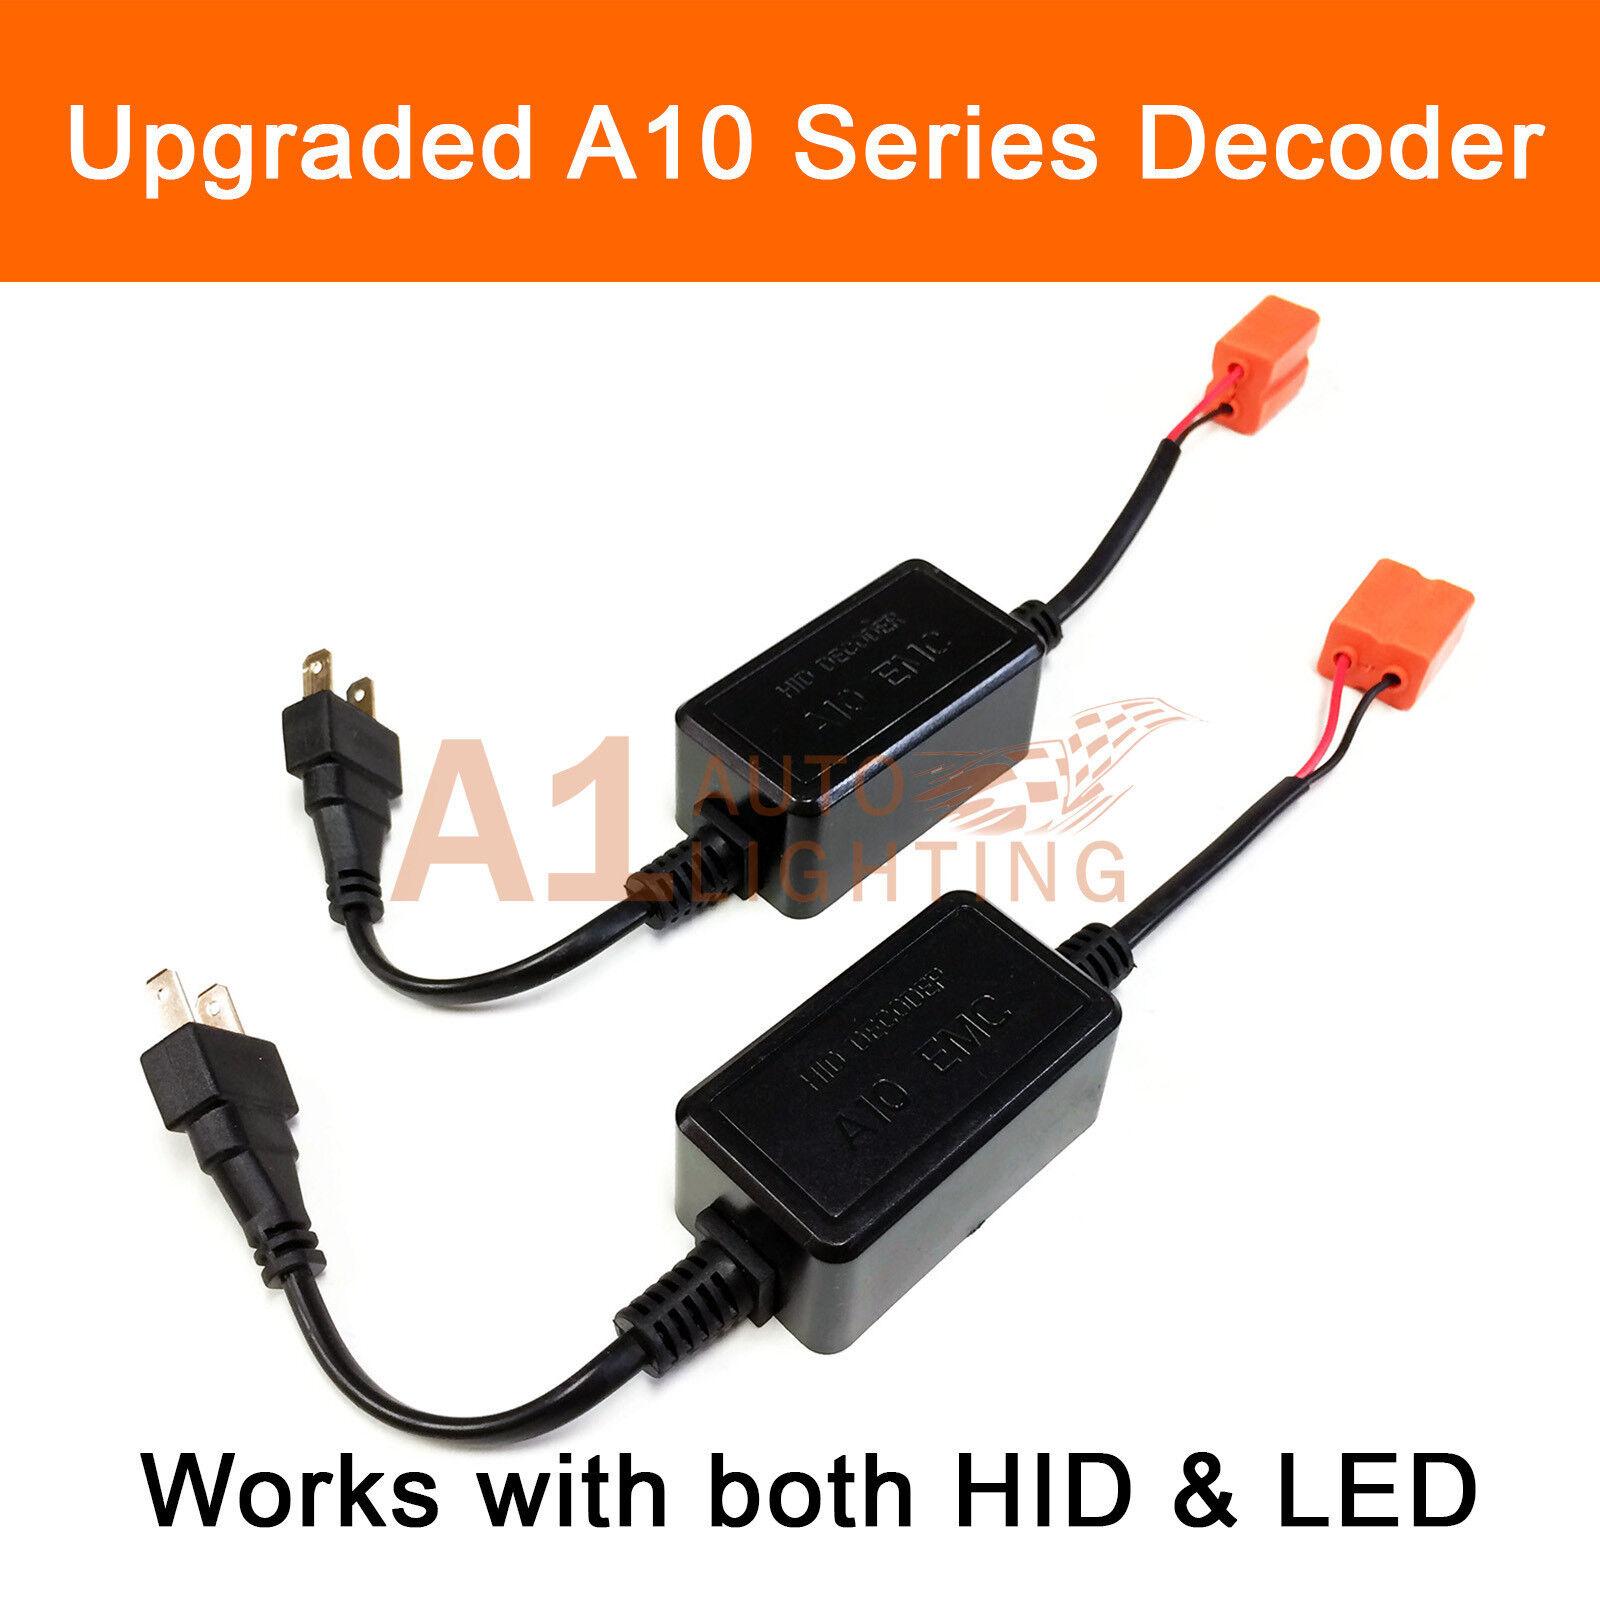 2x A10 Emc H7 Fog Light Canbus Led Decoder Load Resistor Hid Warning Wiring Diagram Canceller